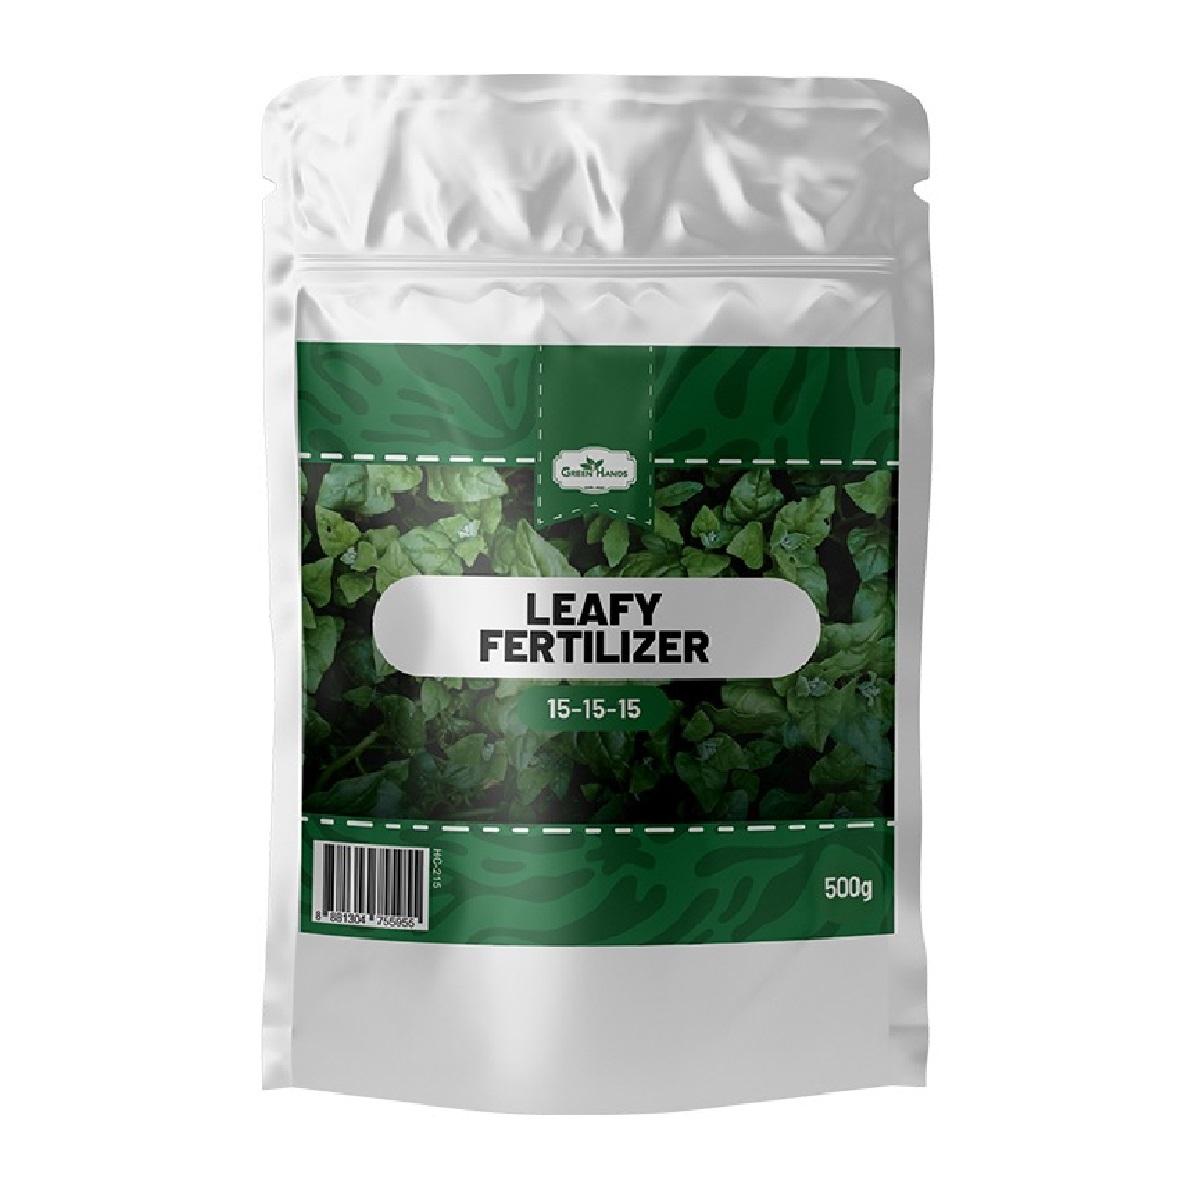 Green Hands 15-15-15 Leafy Fertilizer 500g